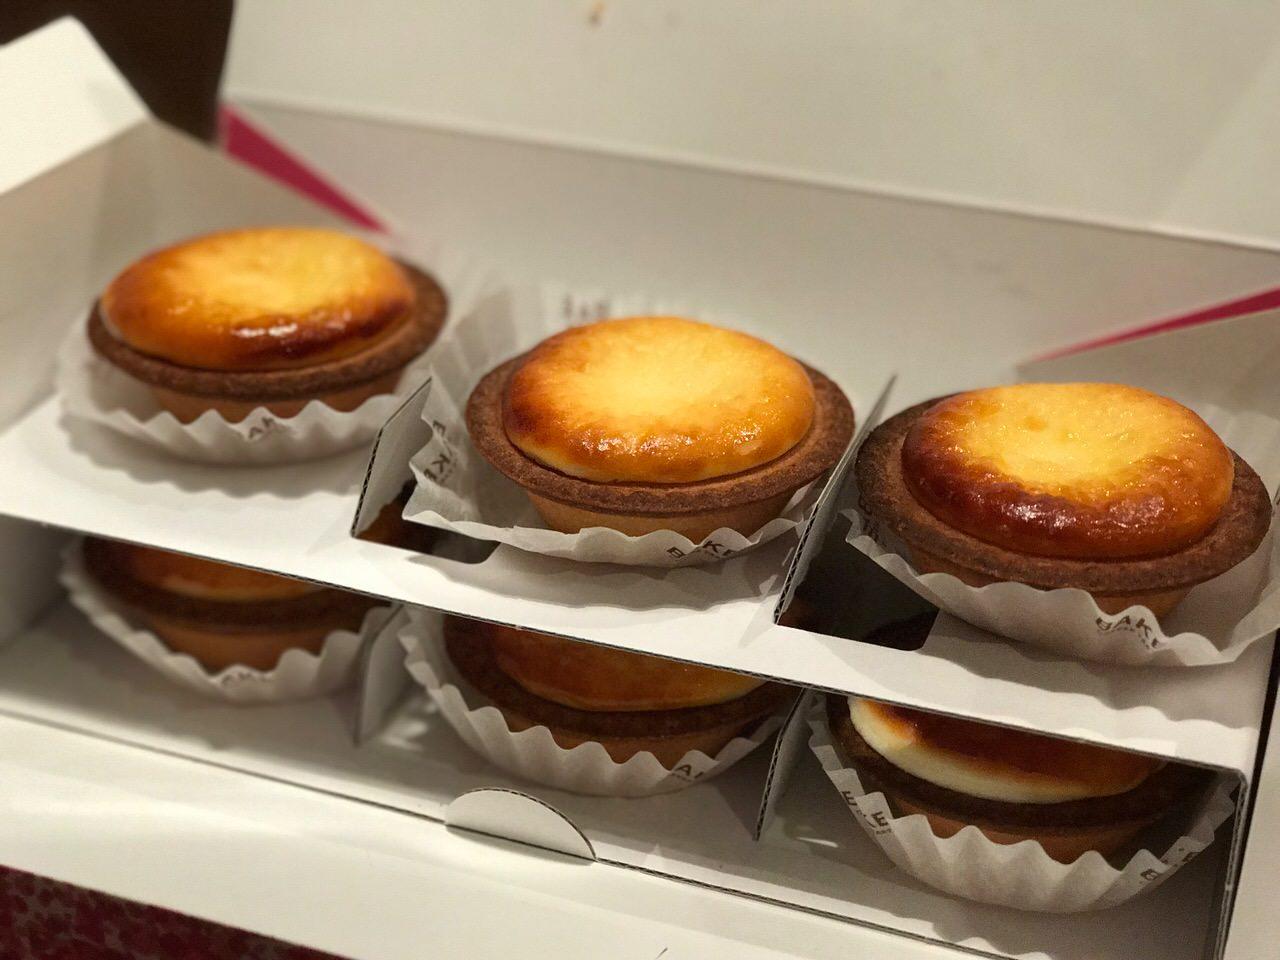 「BAKE(ベイク)」北海道発の焼き立てチーズタルトがこんなに美味かったとは